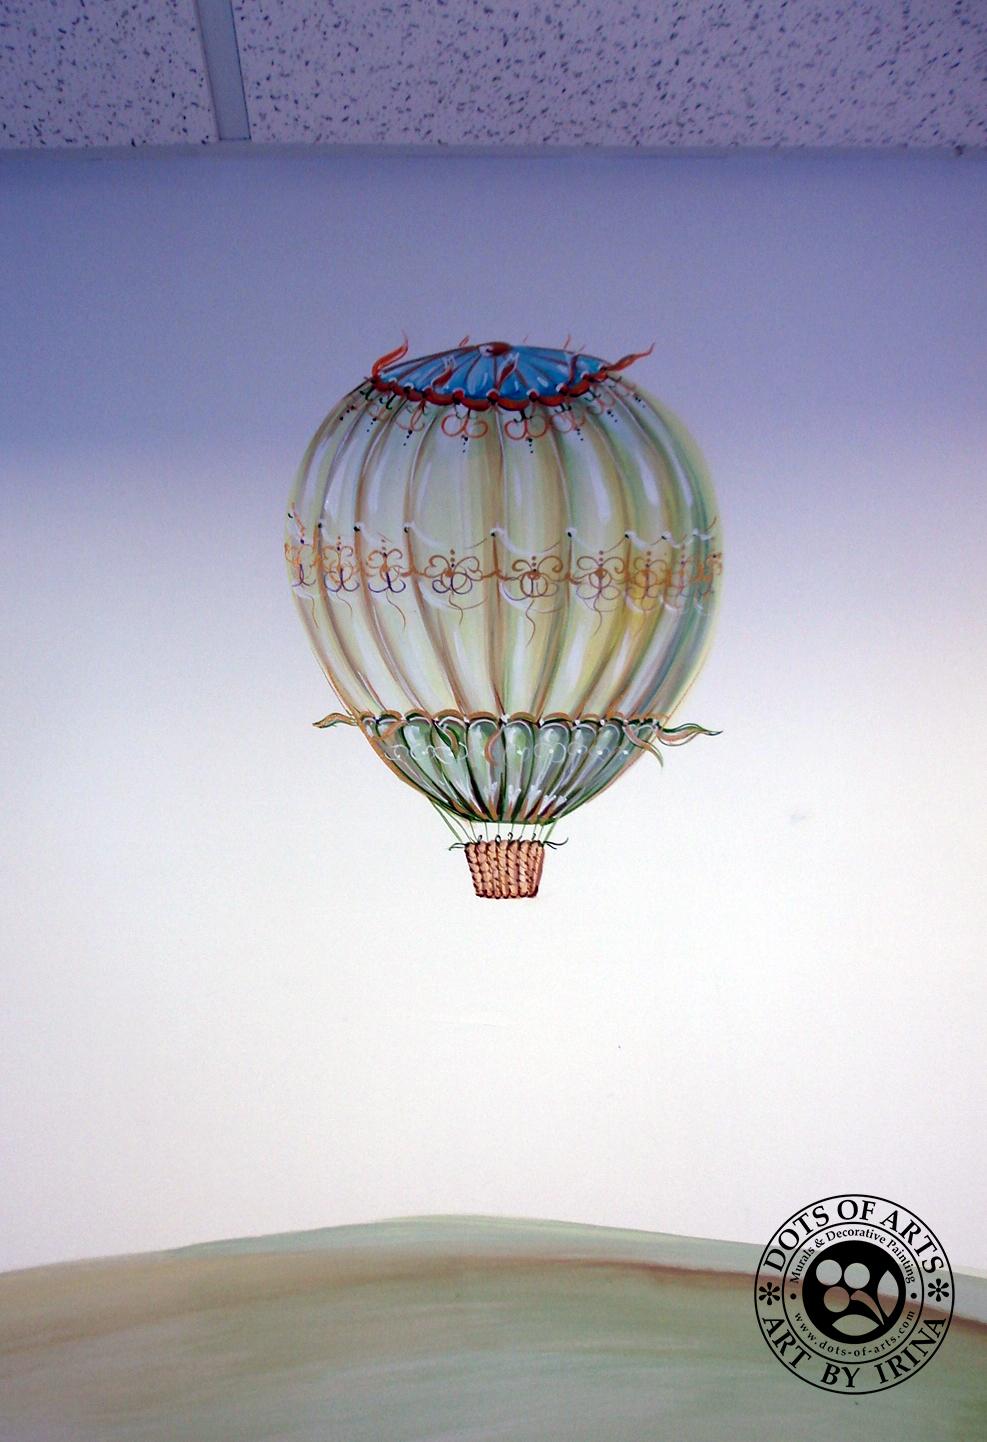 mural-custom-wall-commercial-kidz-kuts-woodbridge-nj-dots-of-arts-hot-air-baloon.jpg